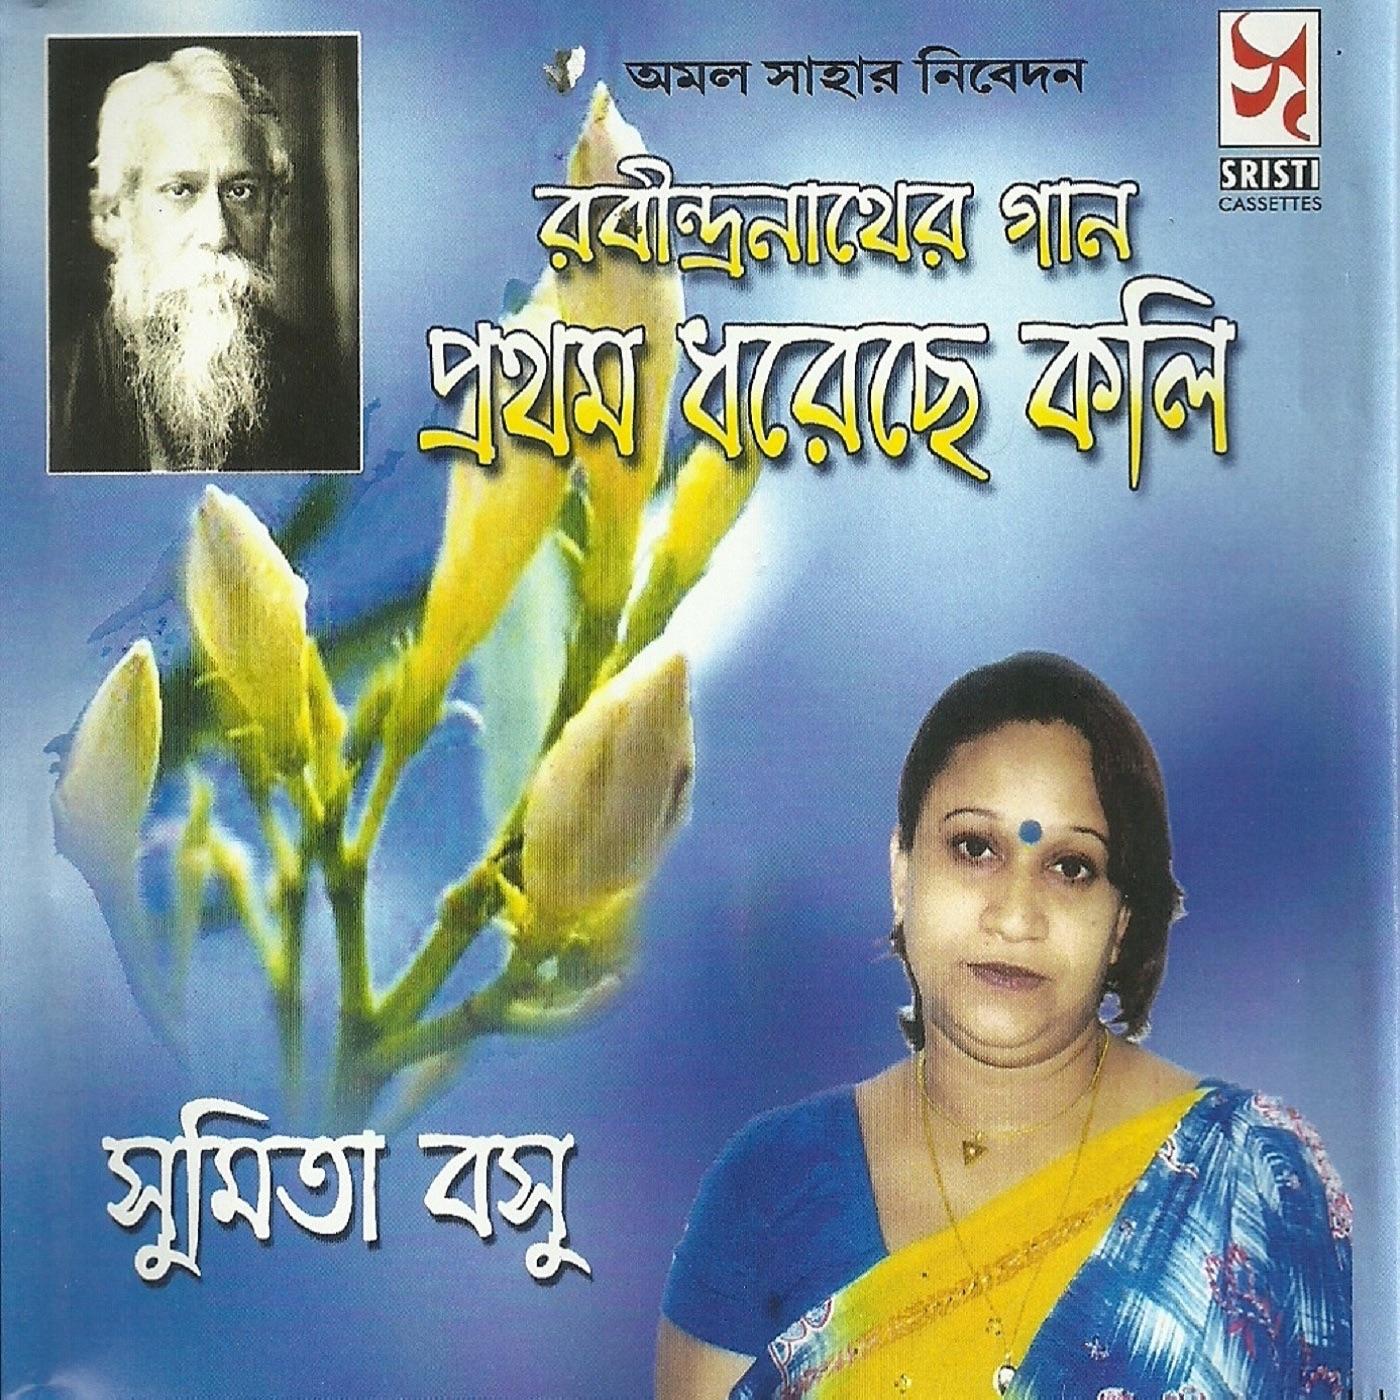 Pratham Dharechhe Koli